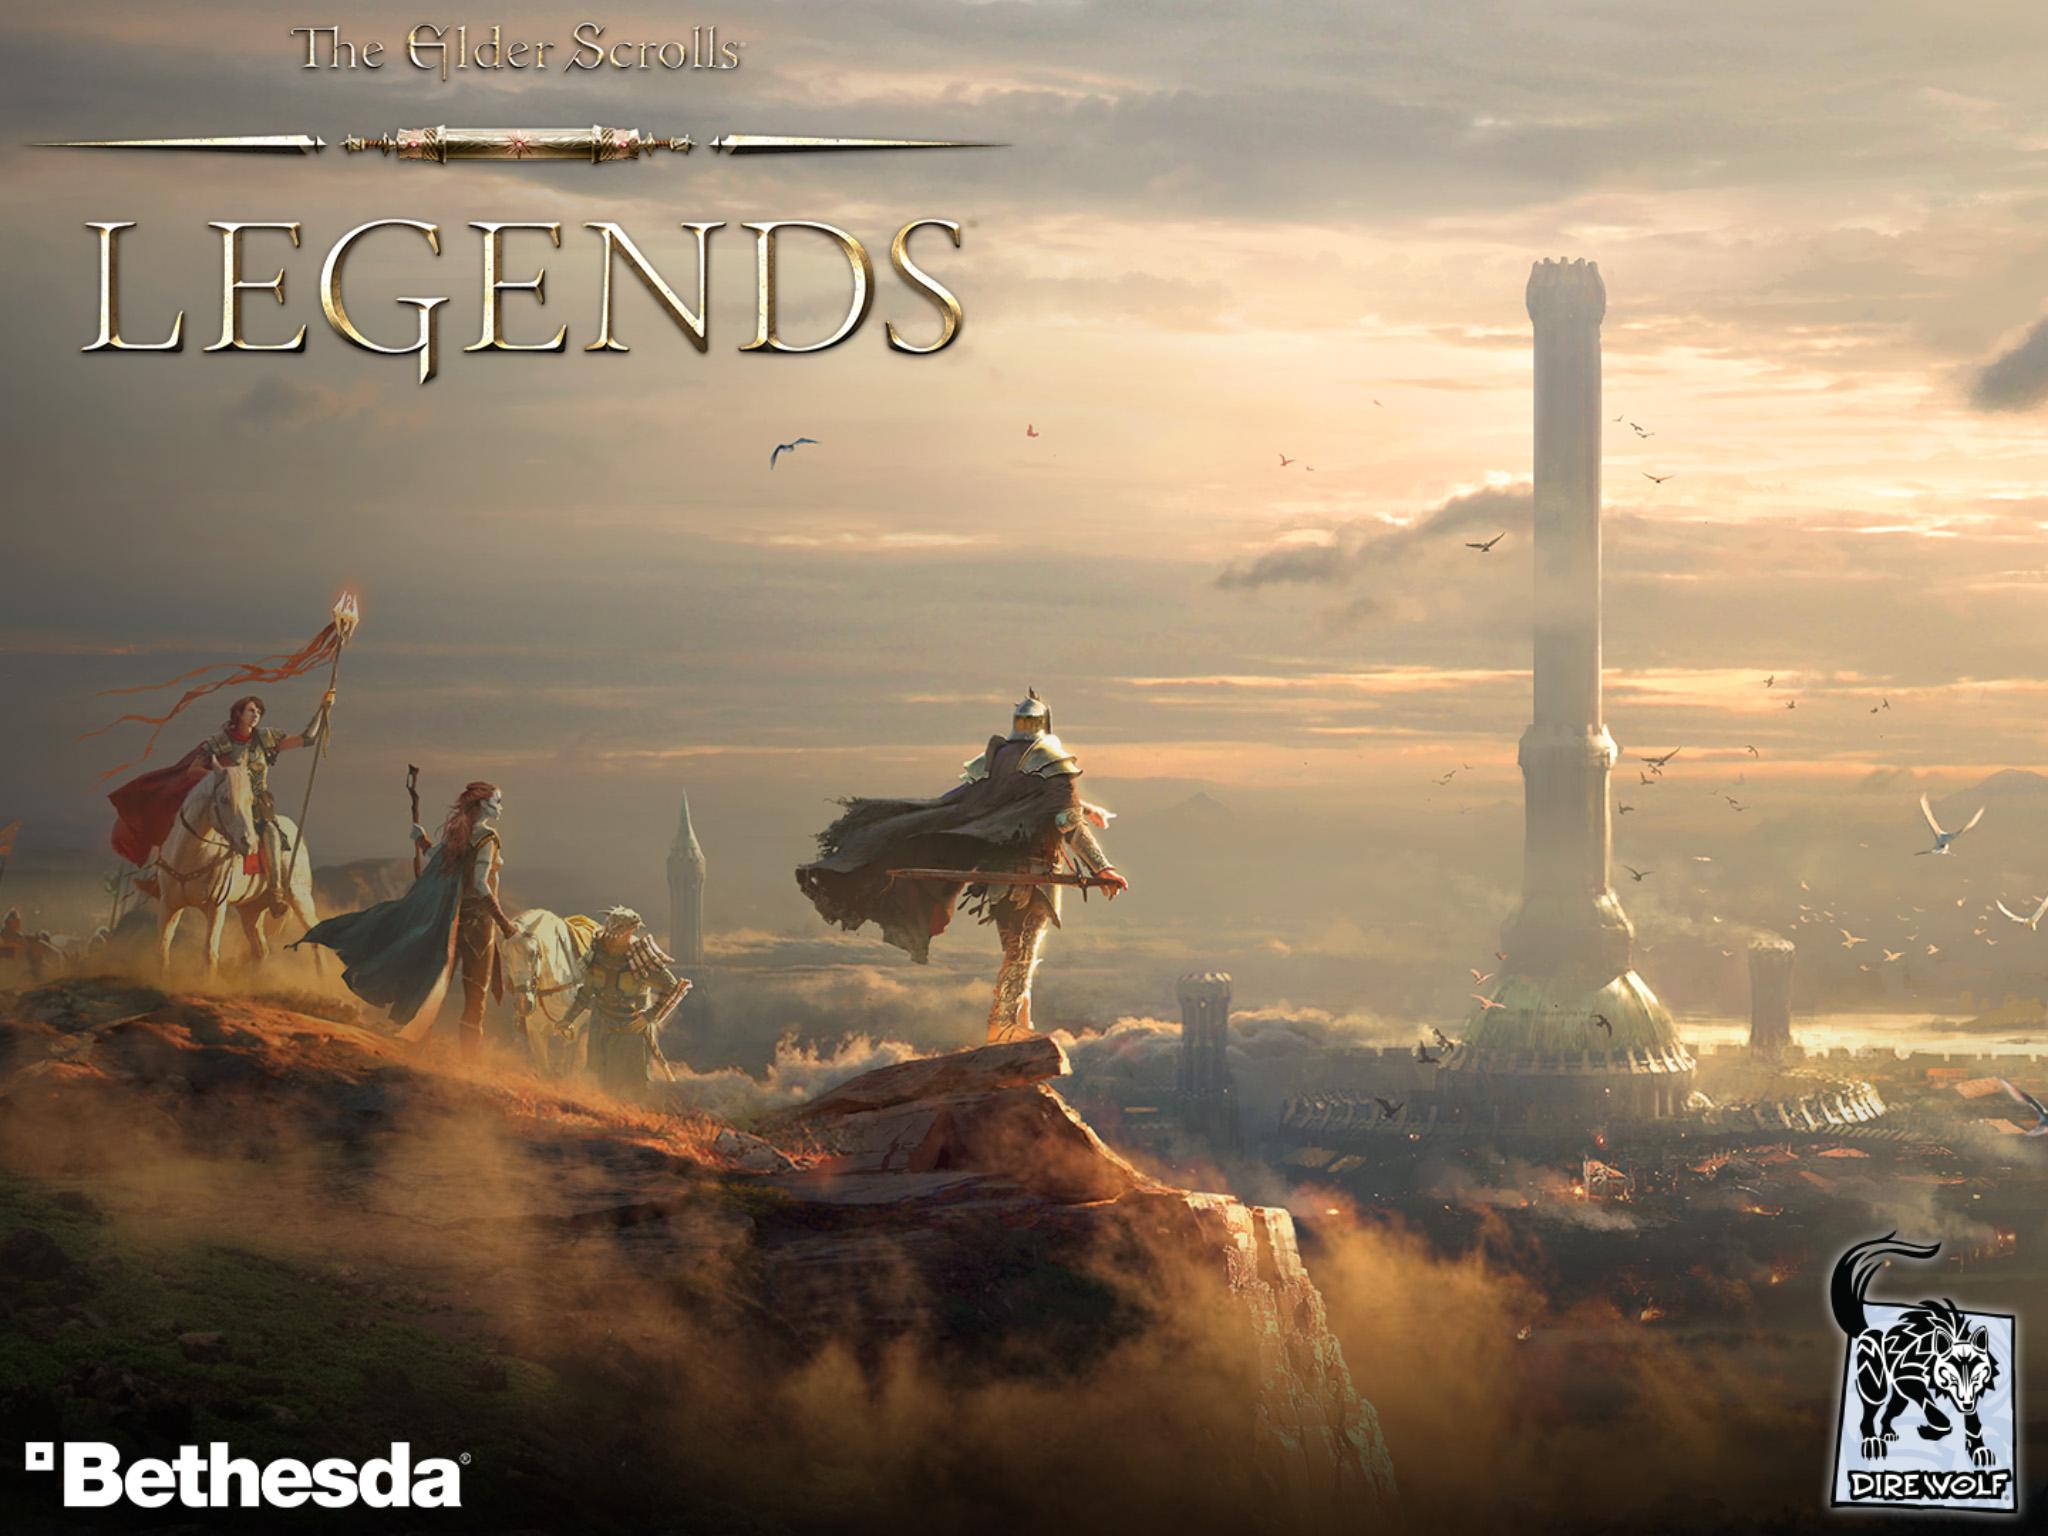 Skyrim Iphone X Wallpaper The Elder Scrolls Legends Review A Breath Of Fresh Air